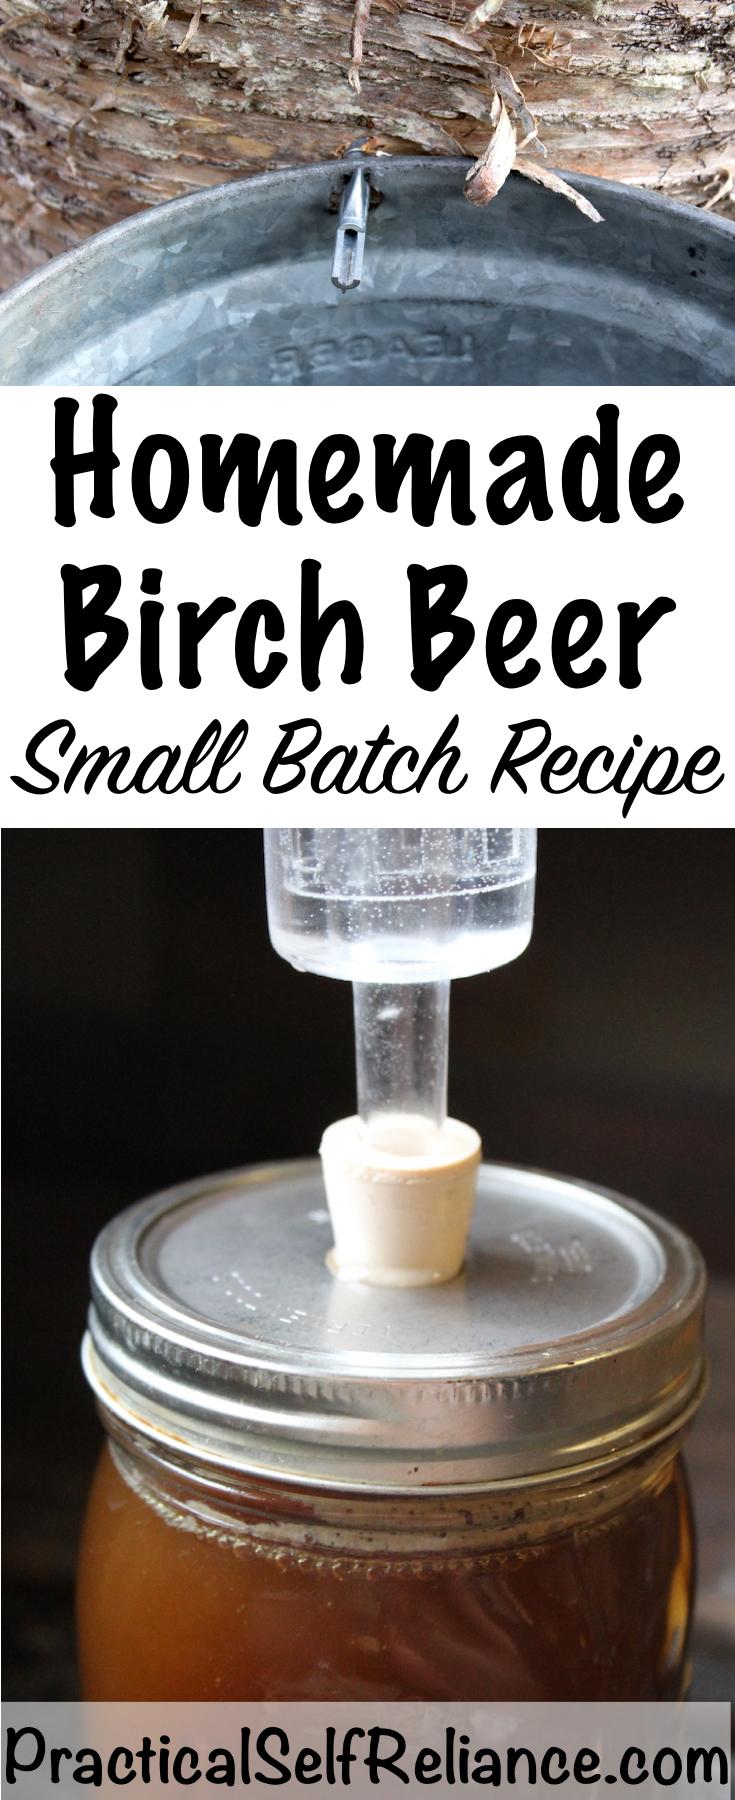 Homemade Birch Beer Recipe